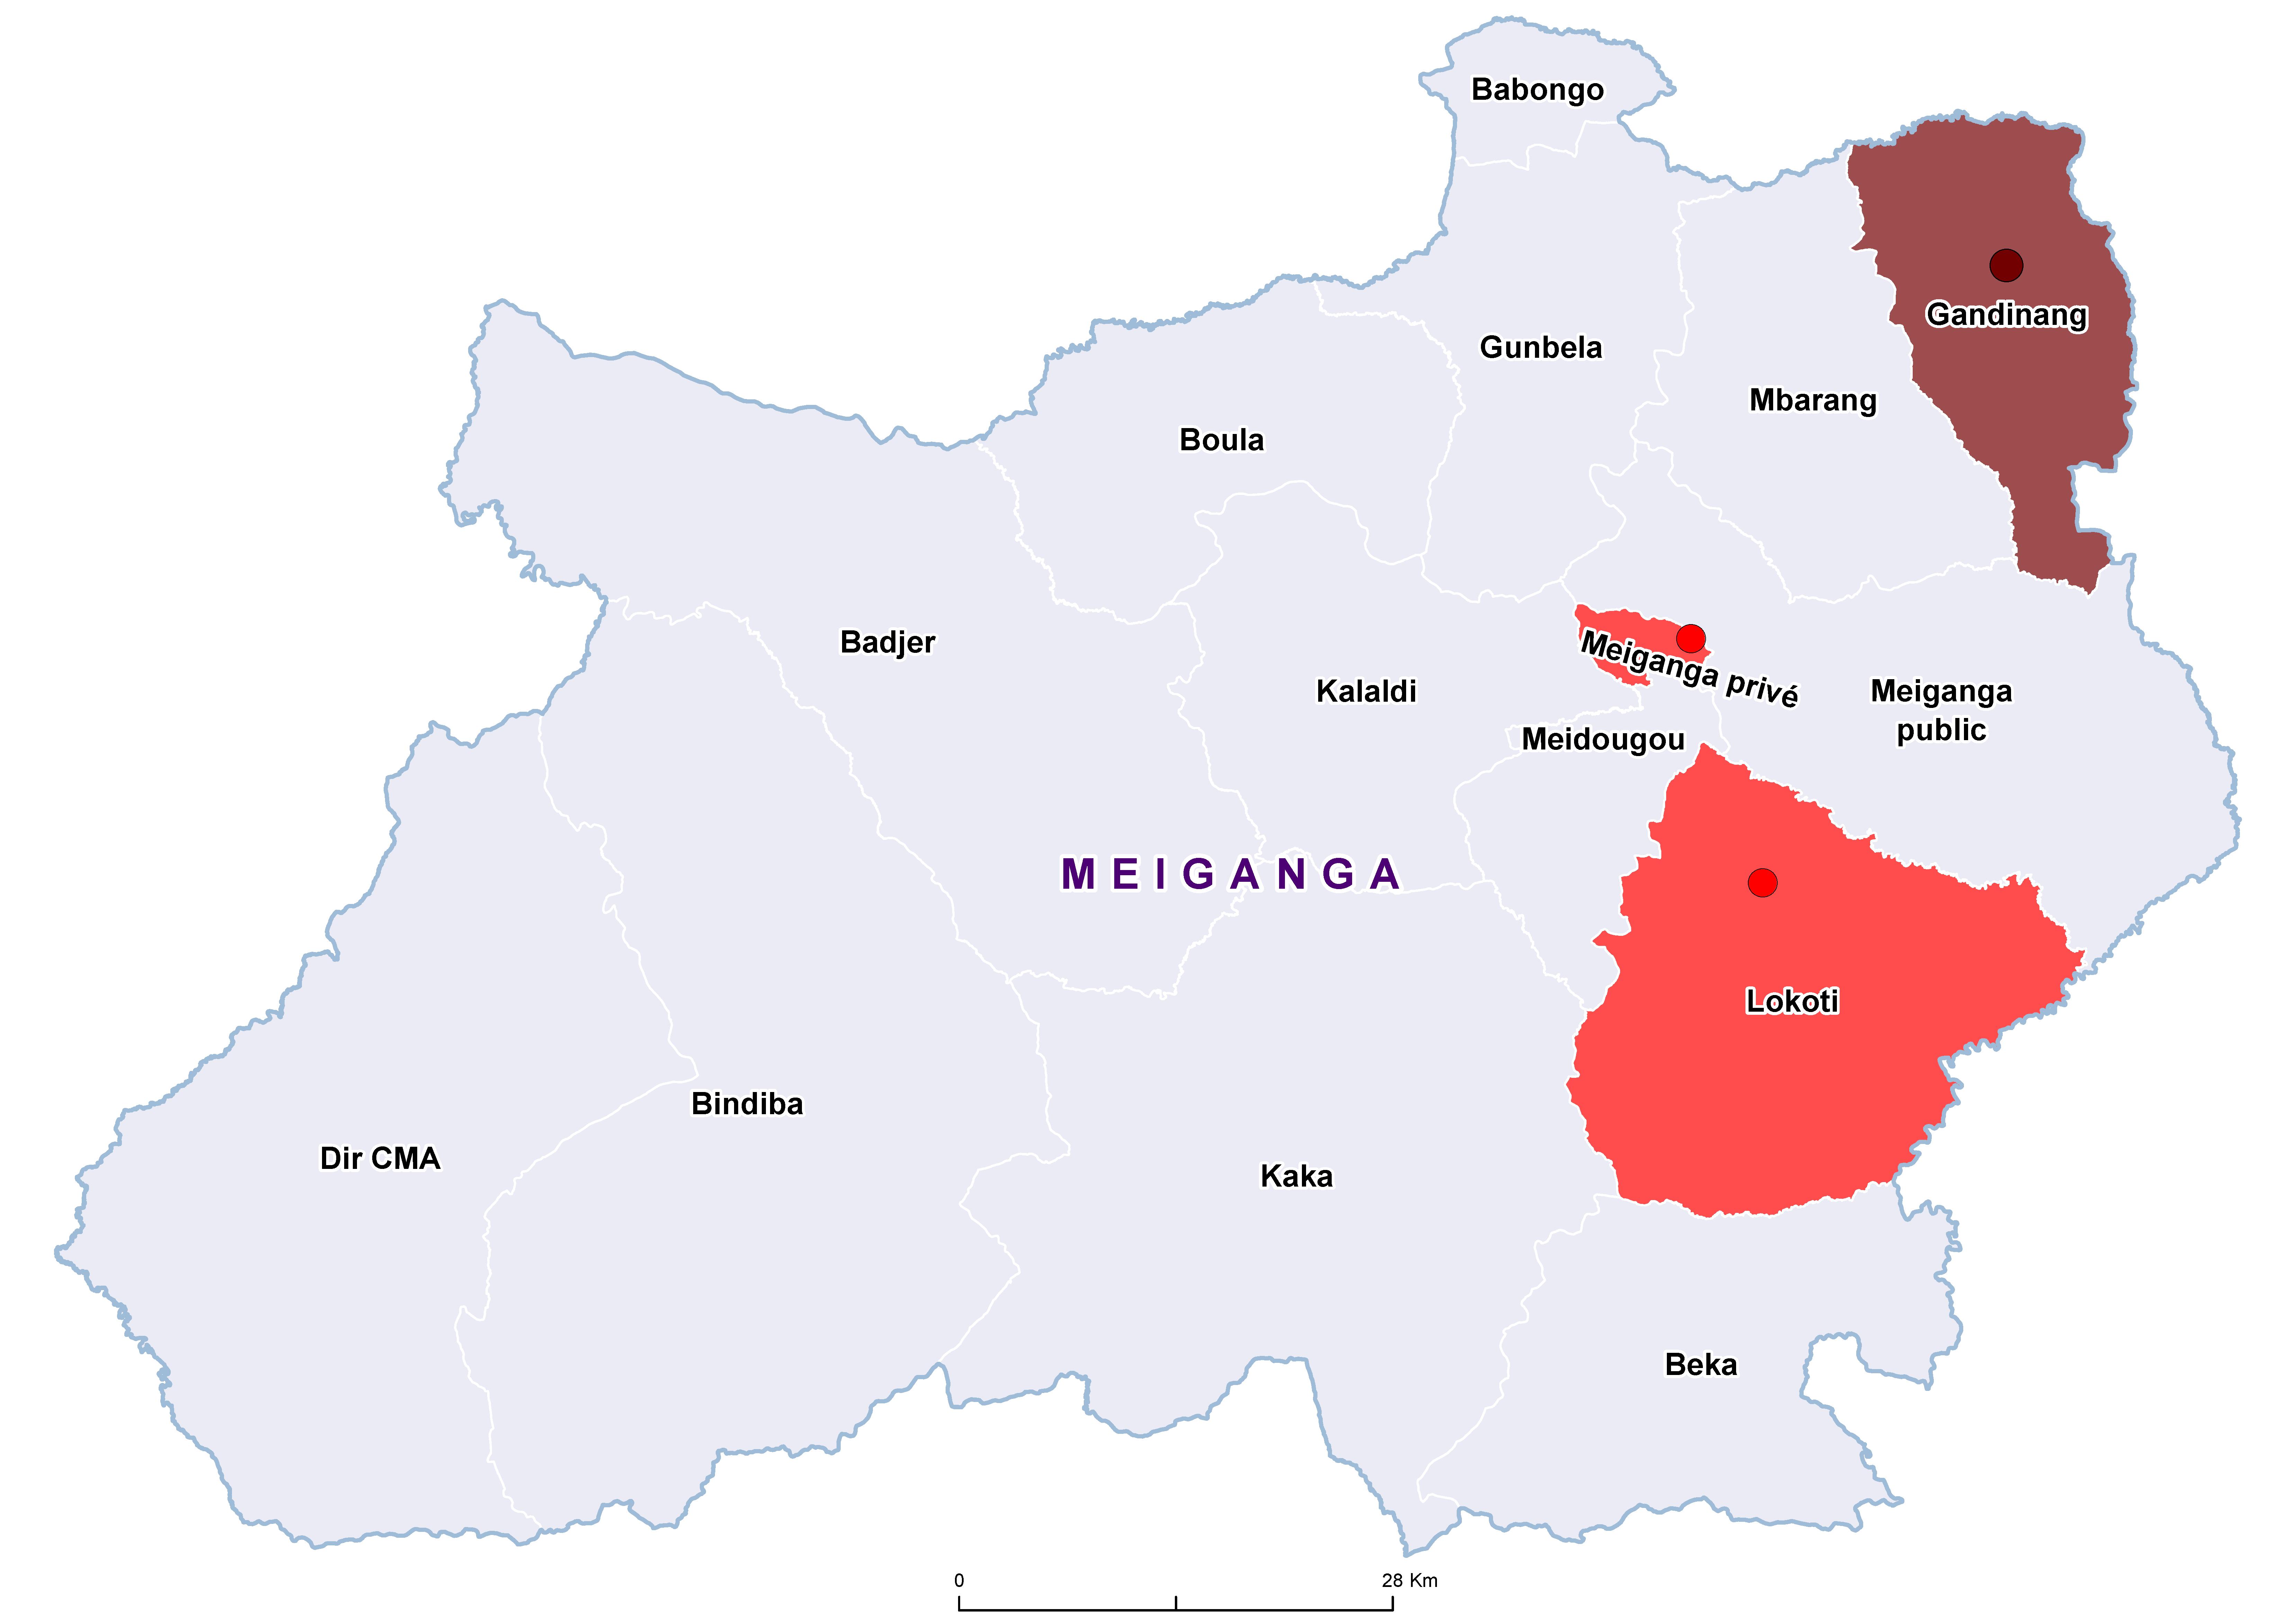 Meiganga STH 19850001